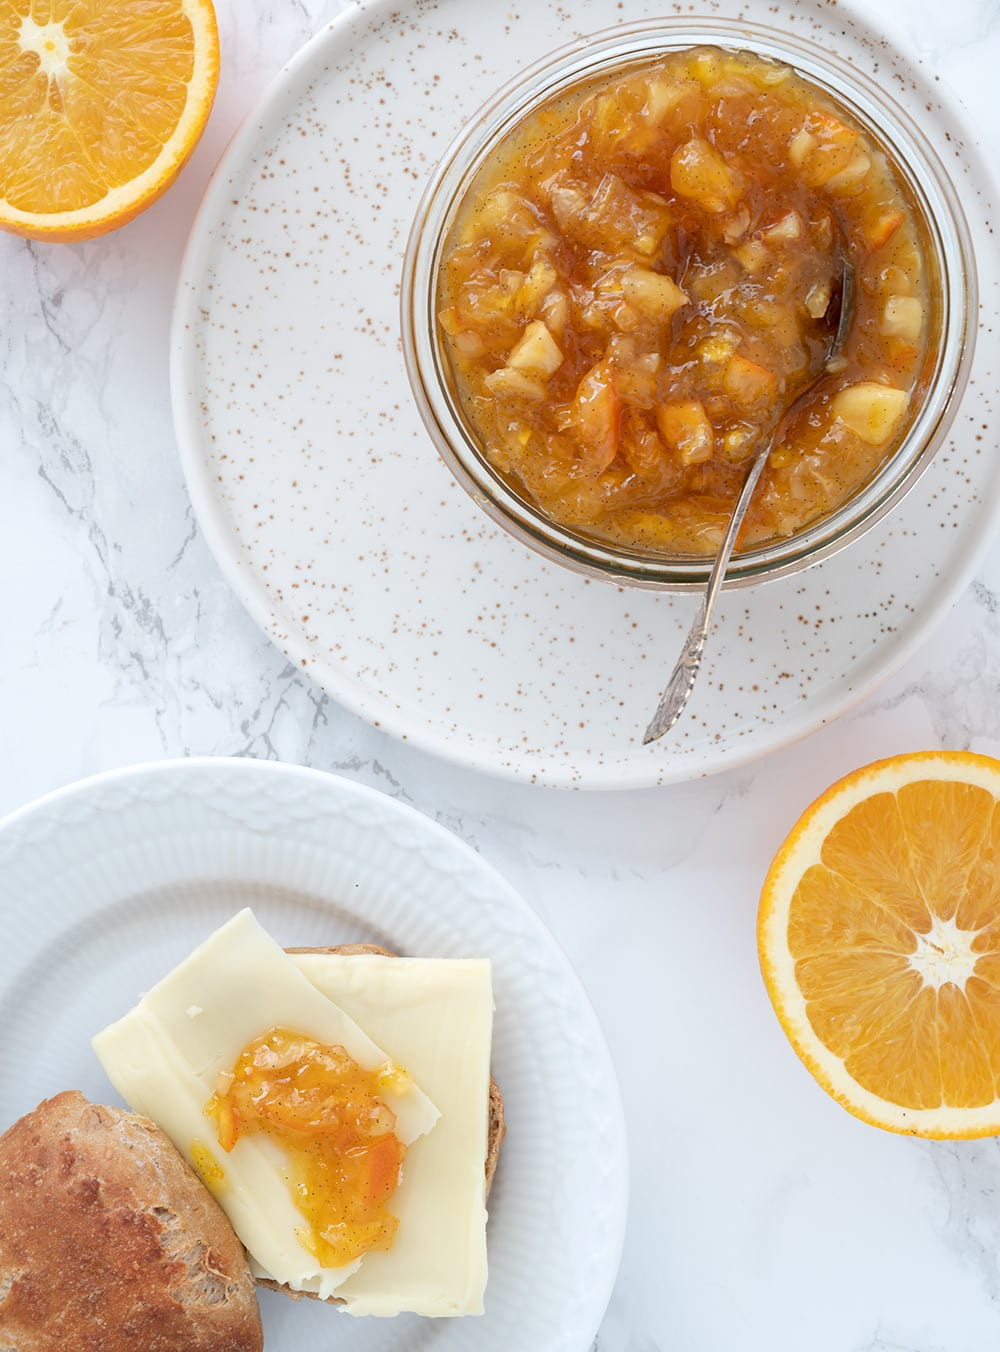 appelsinmarmelade opskrift